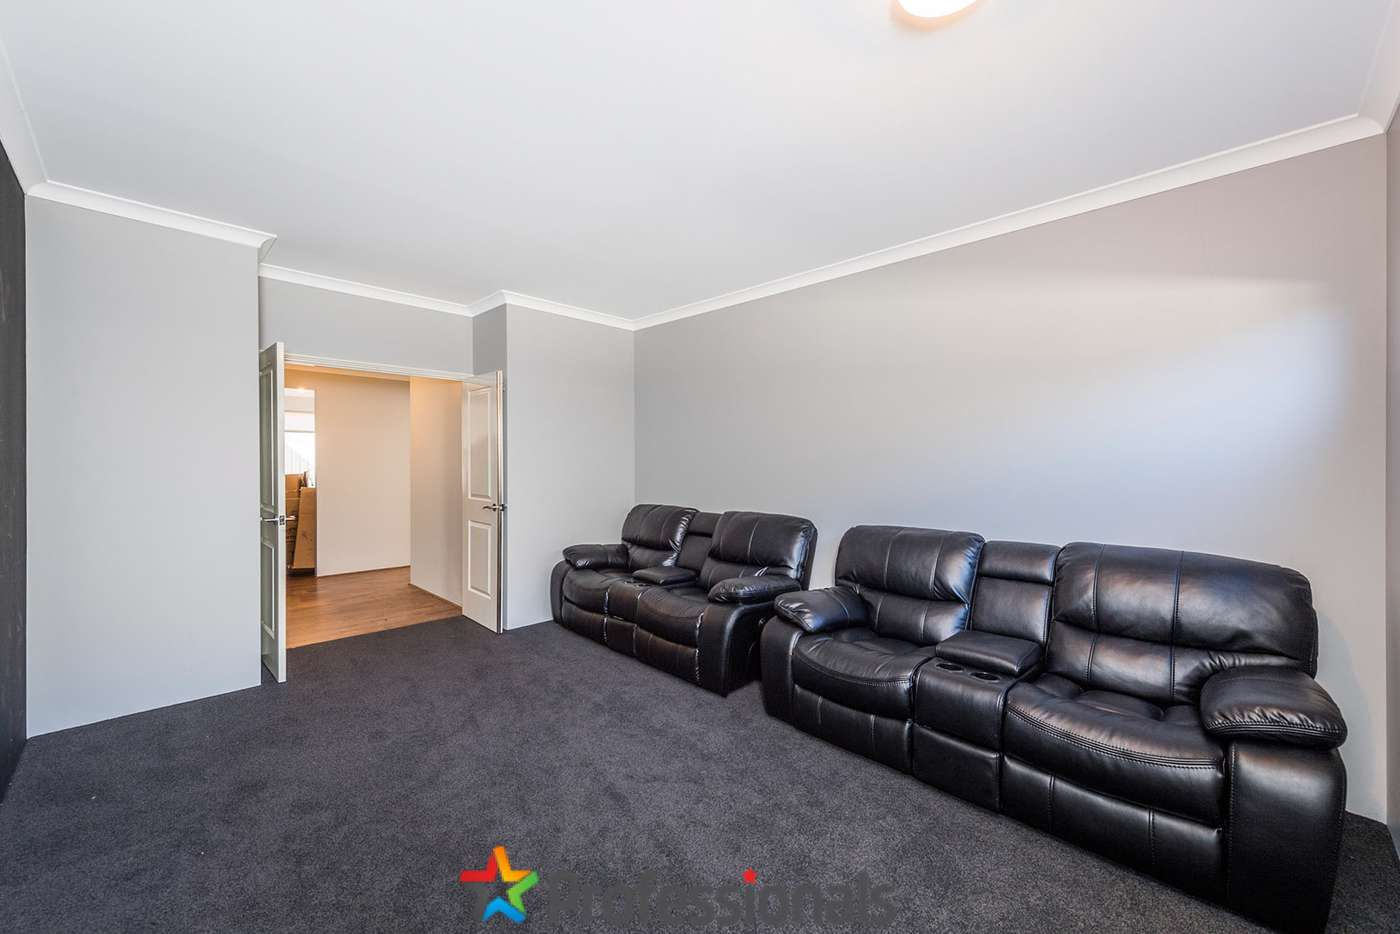 Sixth view of Homely house listing, 112 Nancarrow Way, Ravenswood WA 6208